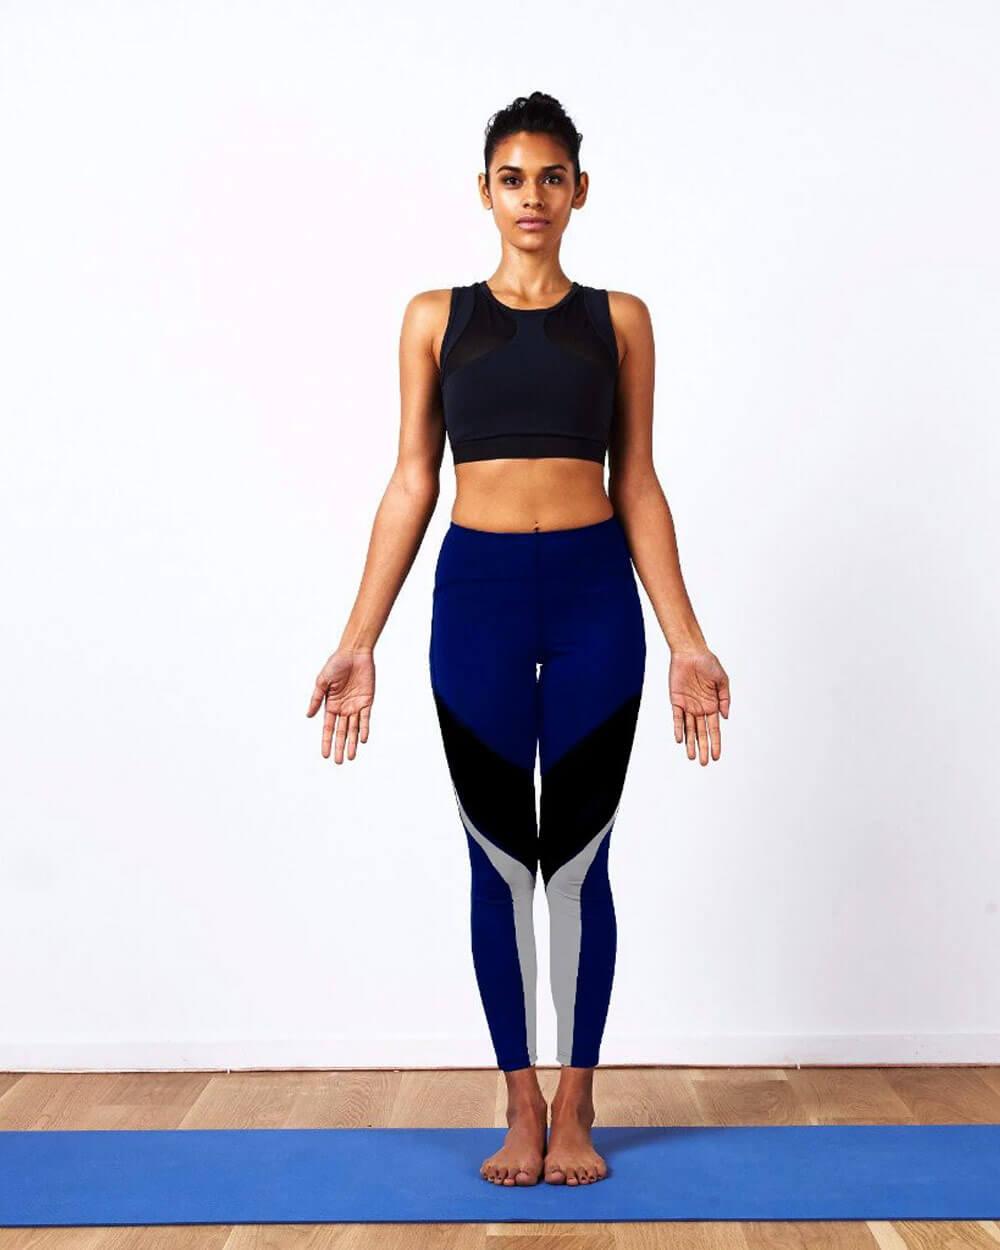 Nadi x Yoga pants smart clothing